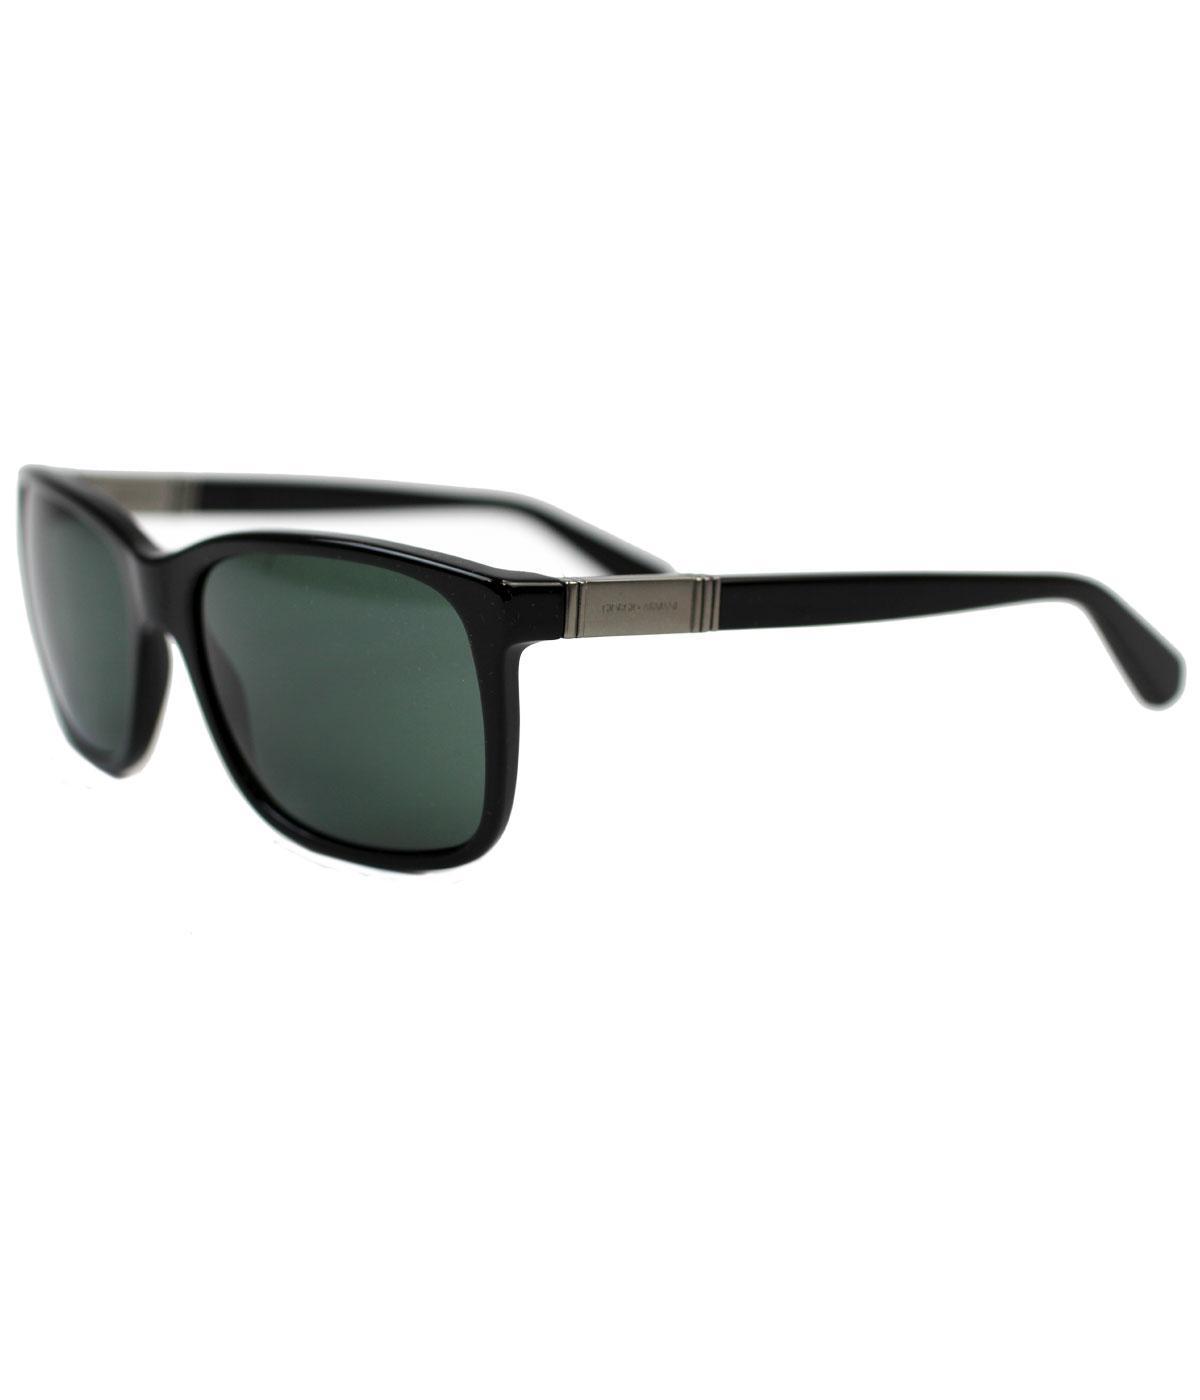 6e9d21922 Giorgio Armani Retro Mod Wayfarer Sunglasses in Black 0AR8016